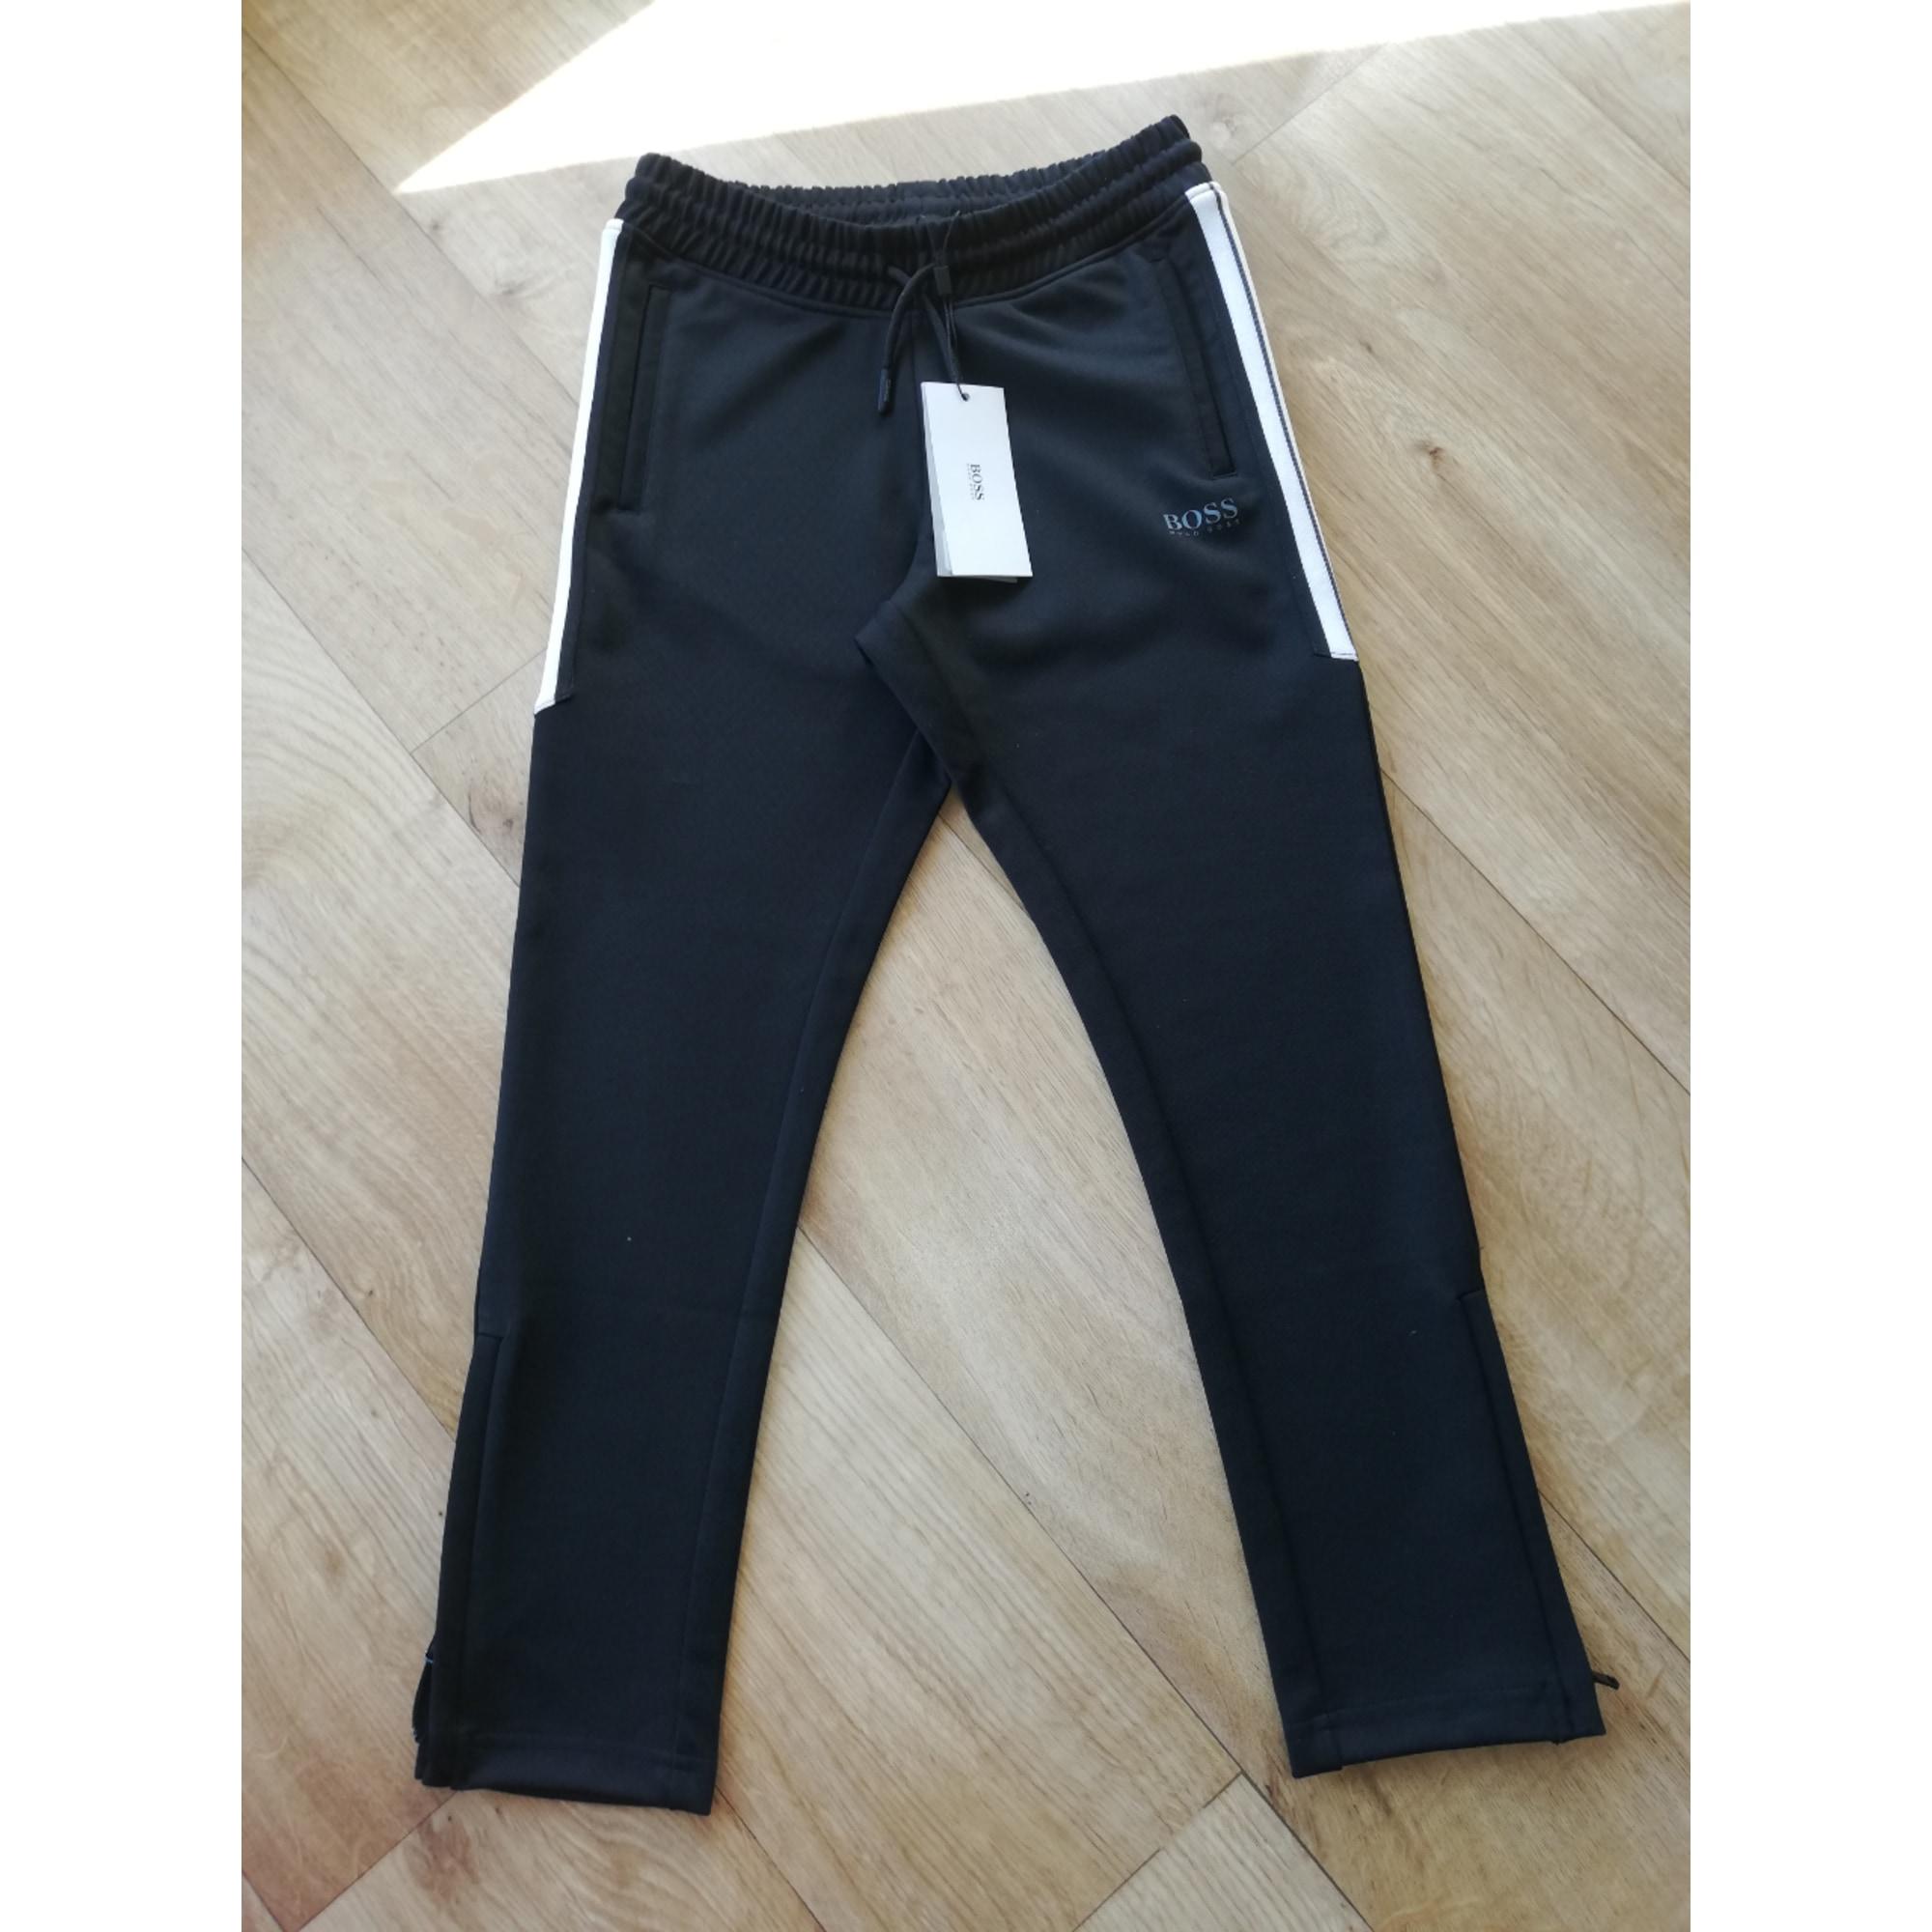 4edf281613 Pantalon HUGO BOSS 7-8 ans noir - 8146805